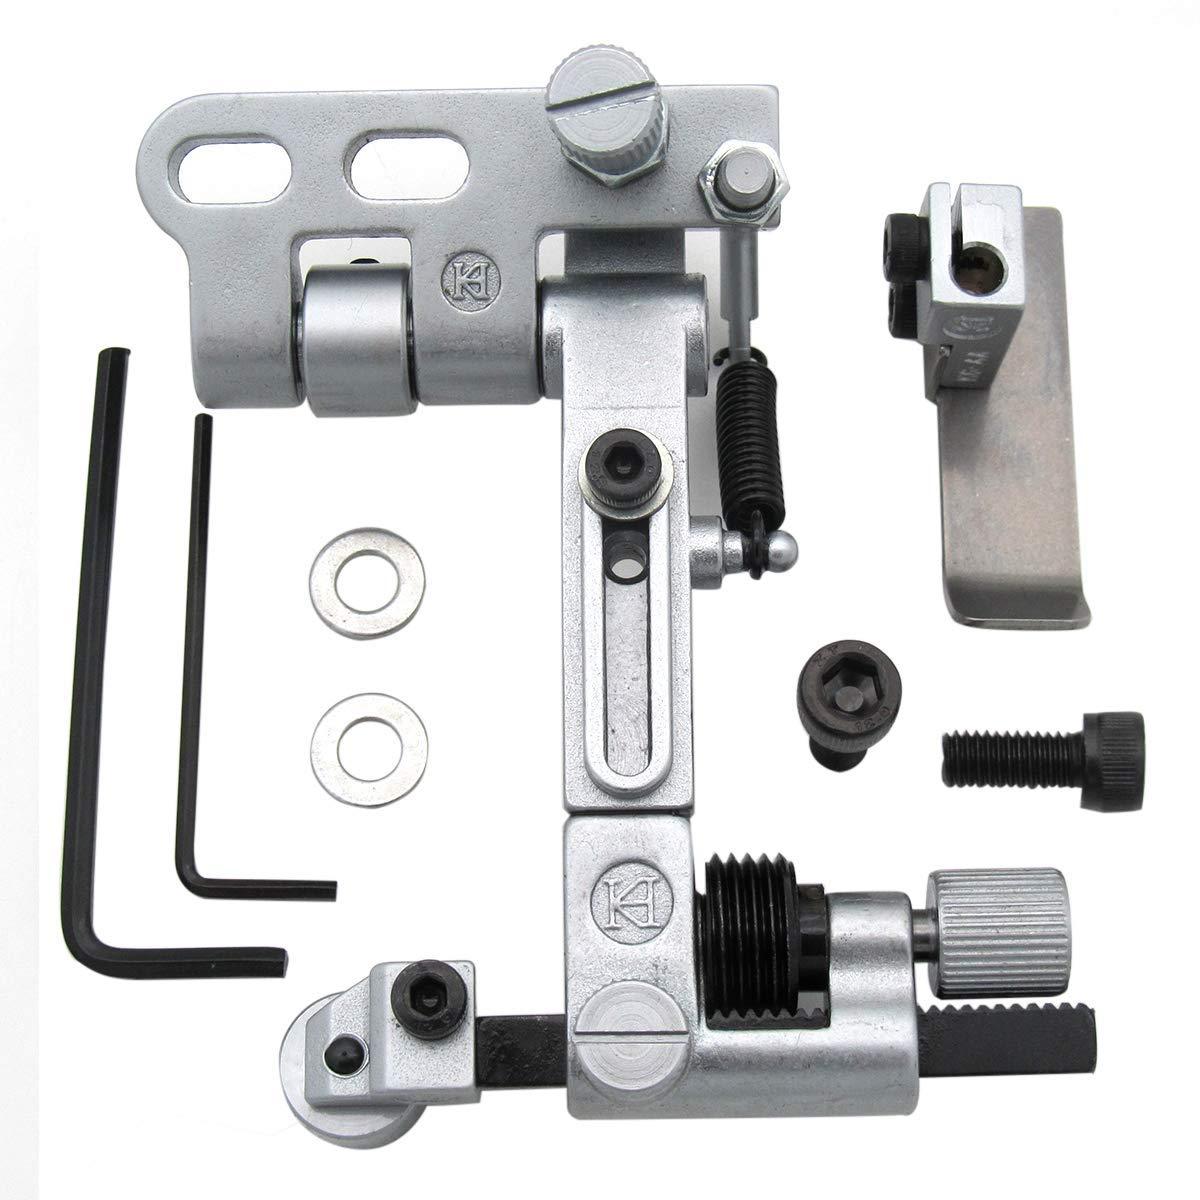 CKPSMS Brand - #KG867A Suspended and Adjustable Guide fit for Pfaff 1245/335 Durkopp Adler 767 Juki DNU-1541/2210 by ckpsms